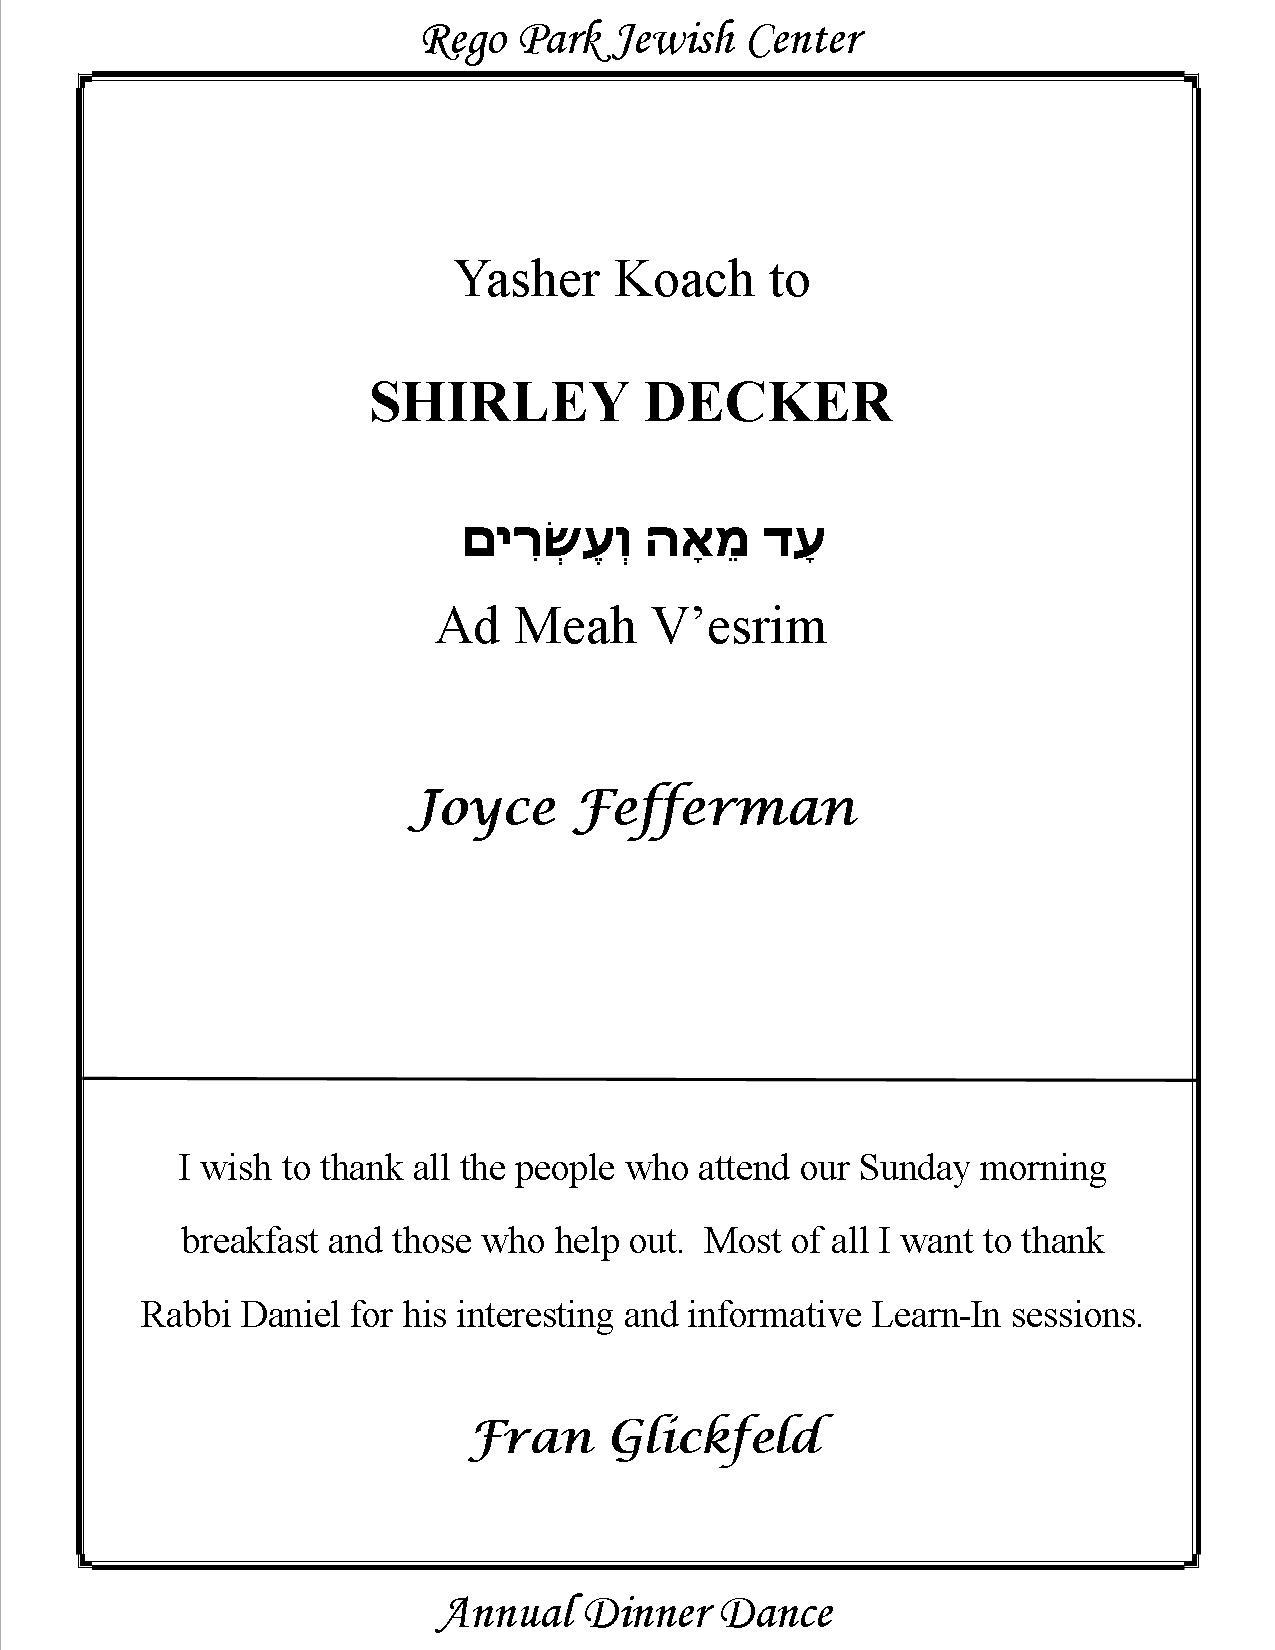 White Fefferman page 49 - Copy.jpg